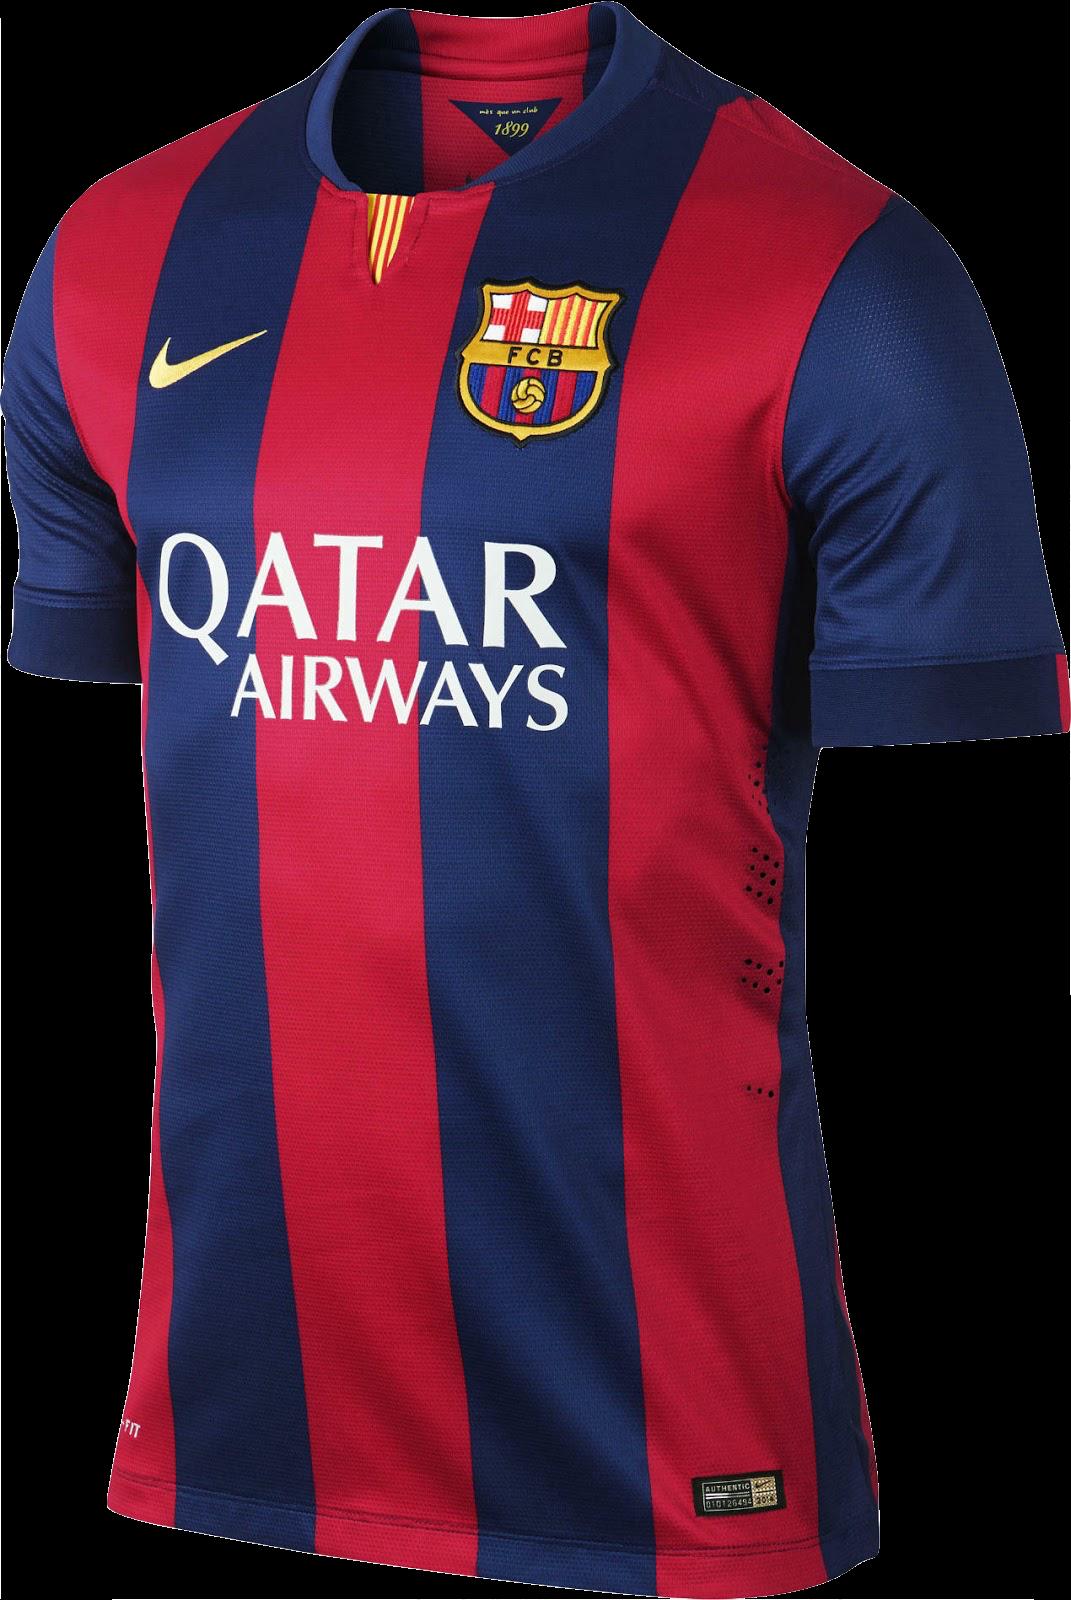 Nike Barcelona Jersey - 5,000 PHP